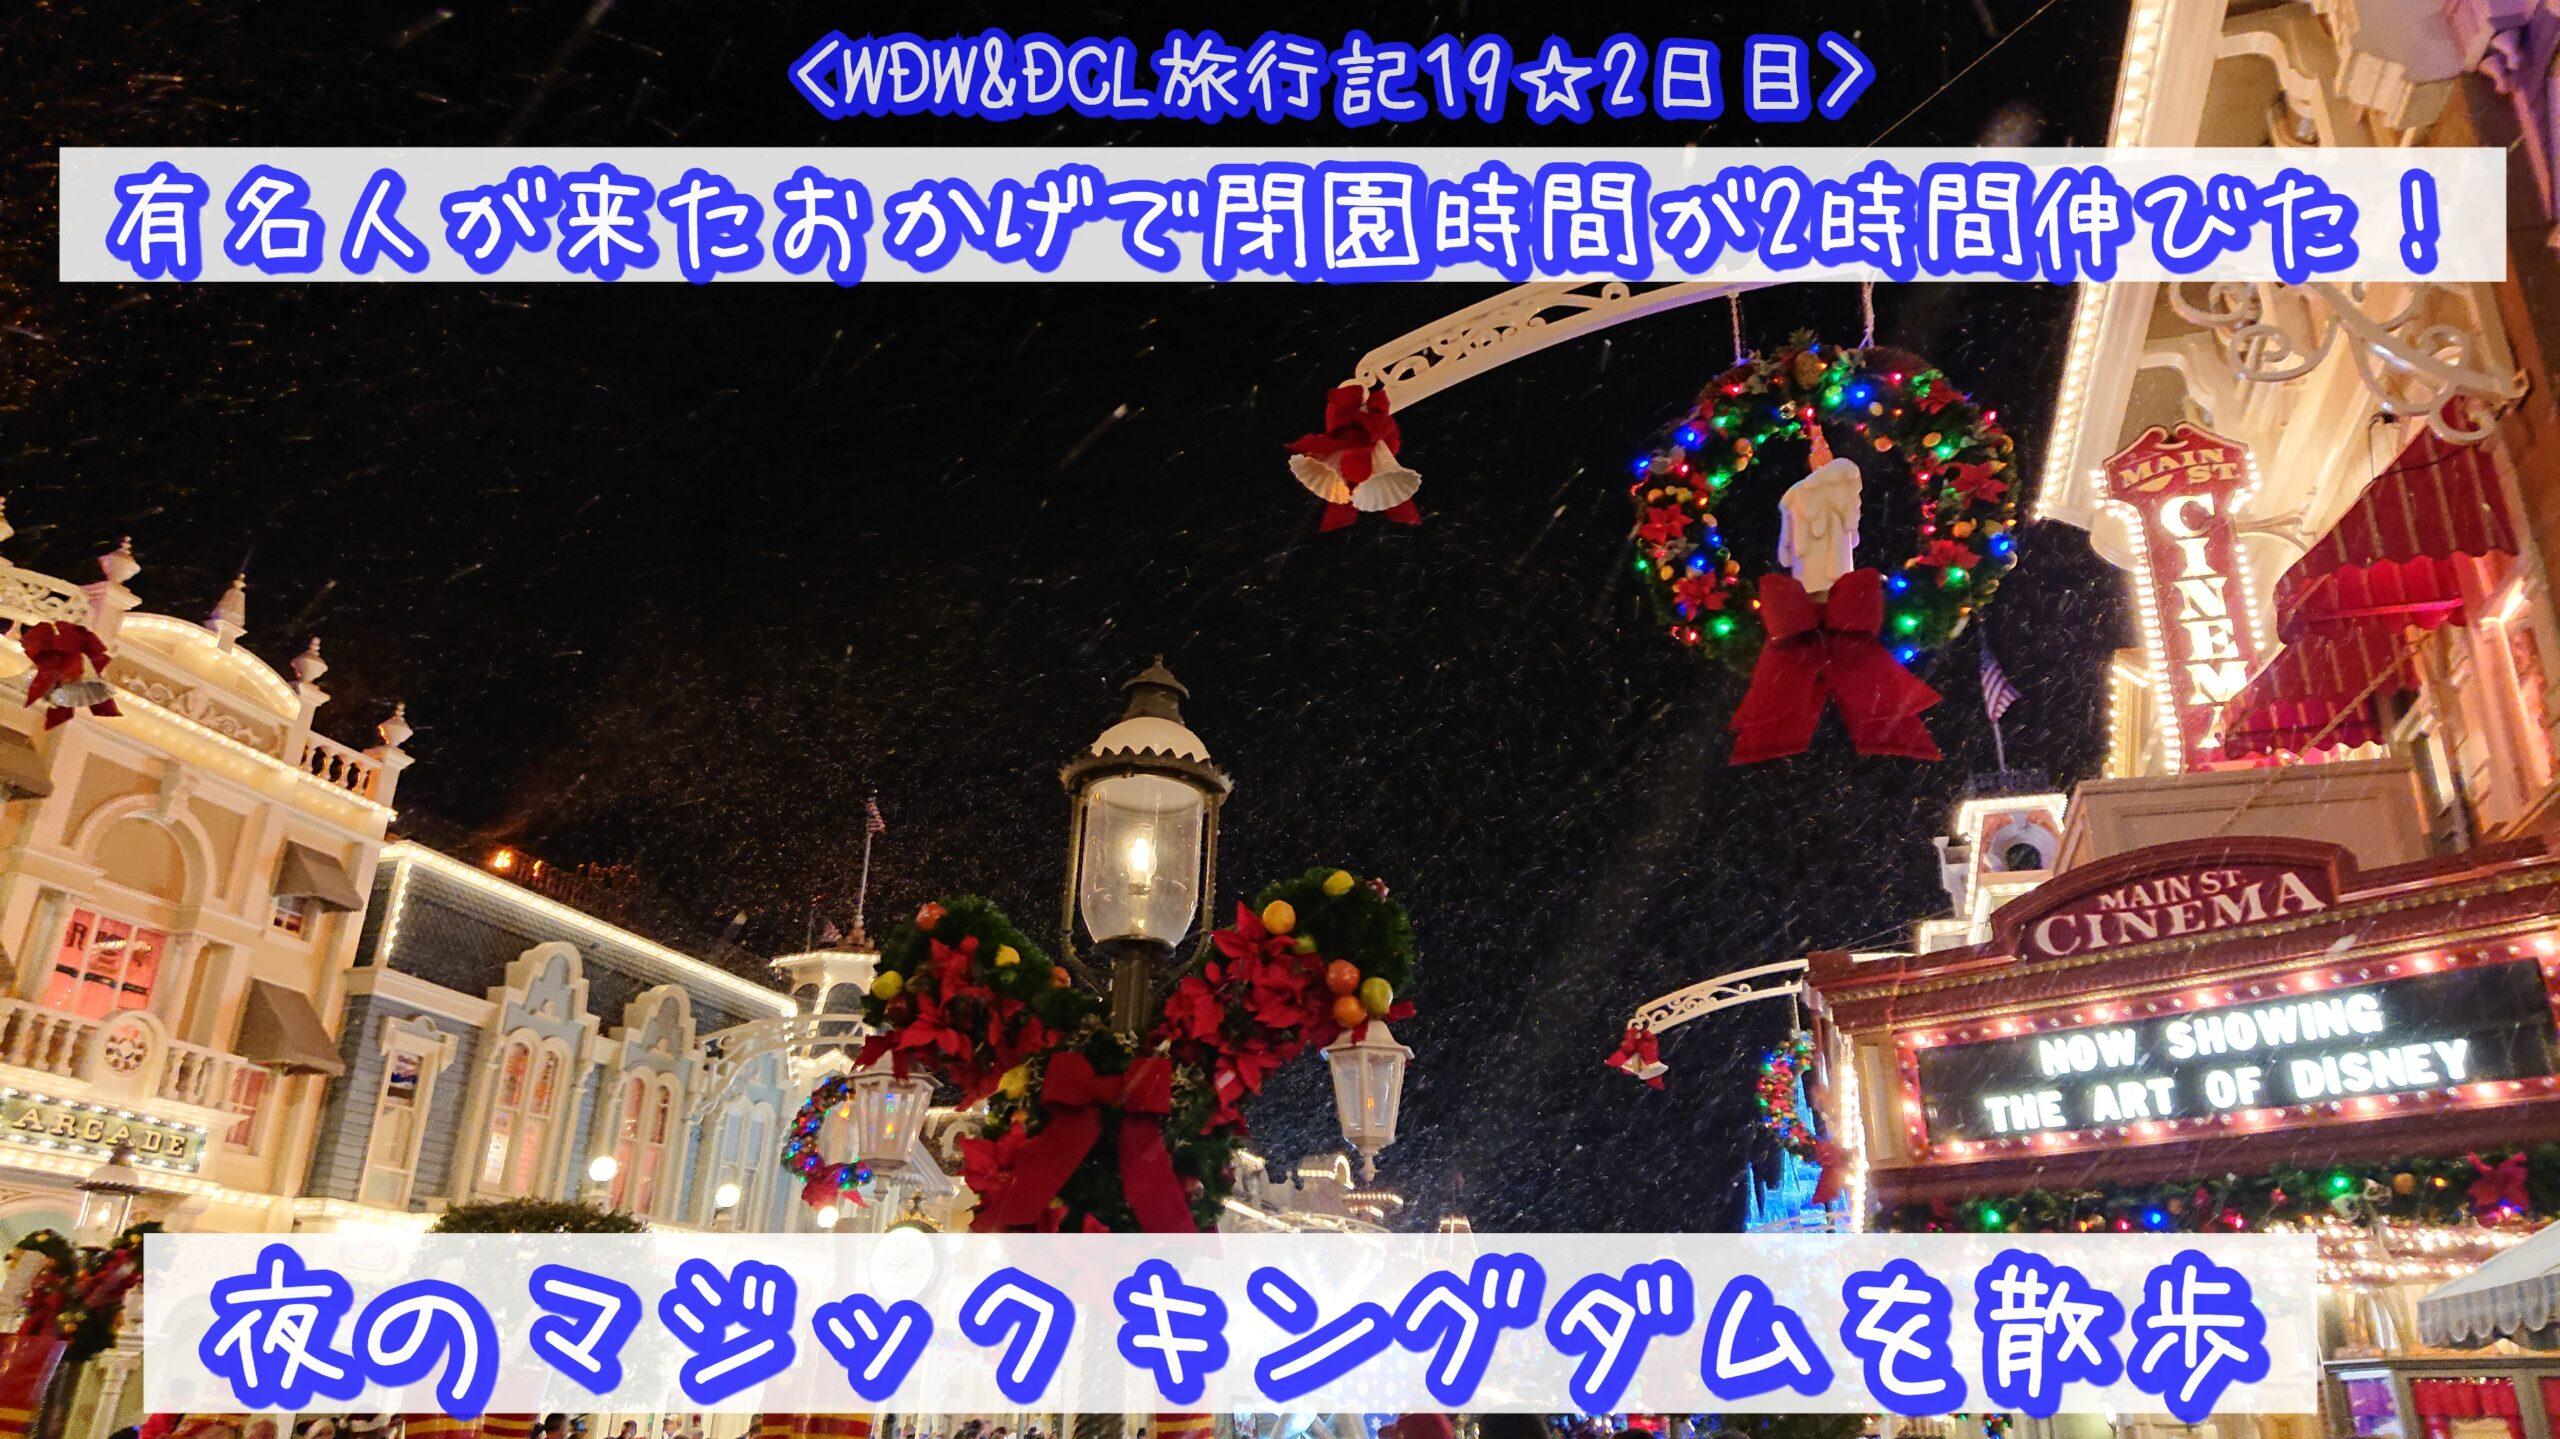 【WDW&DCL】有名人が来たおかげで閉園時間2時間伸びた!夜のマジックキングダム散歩